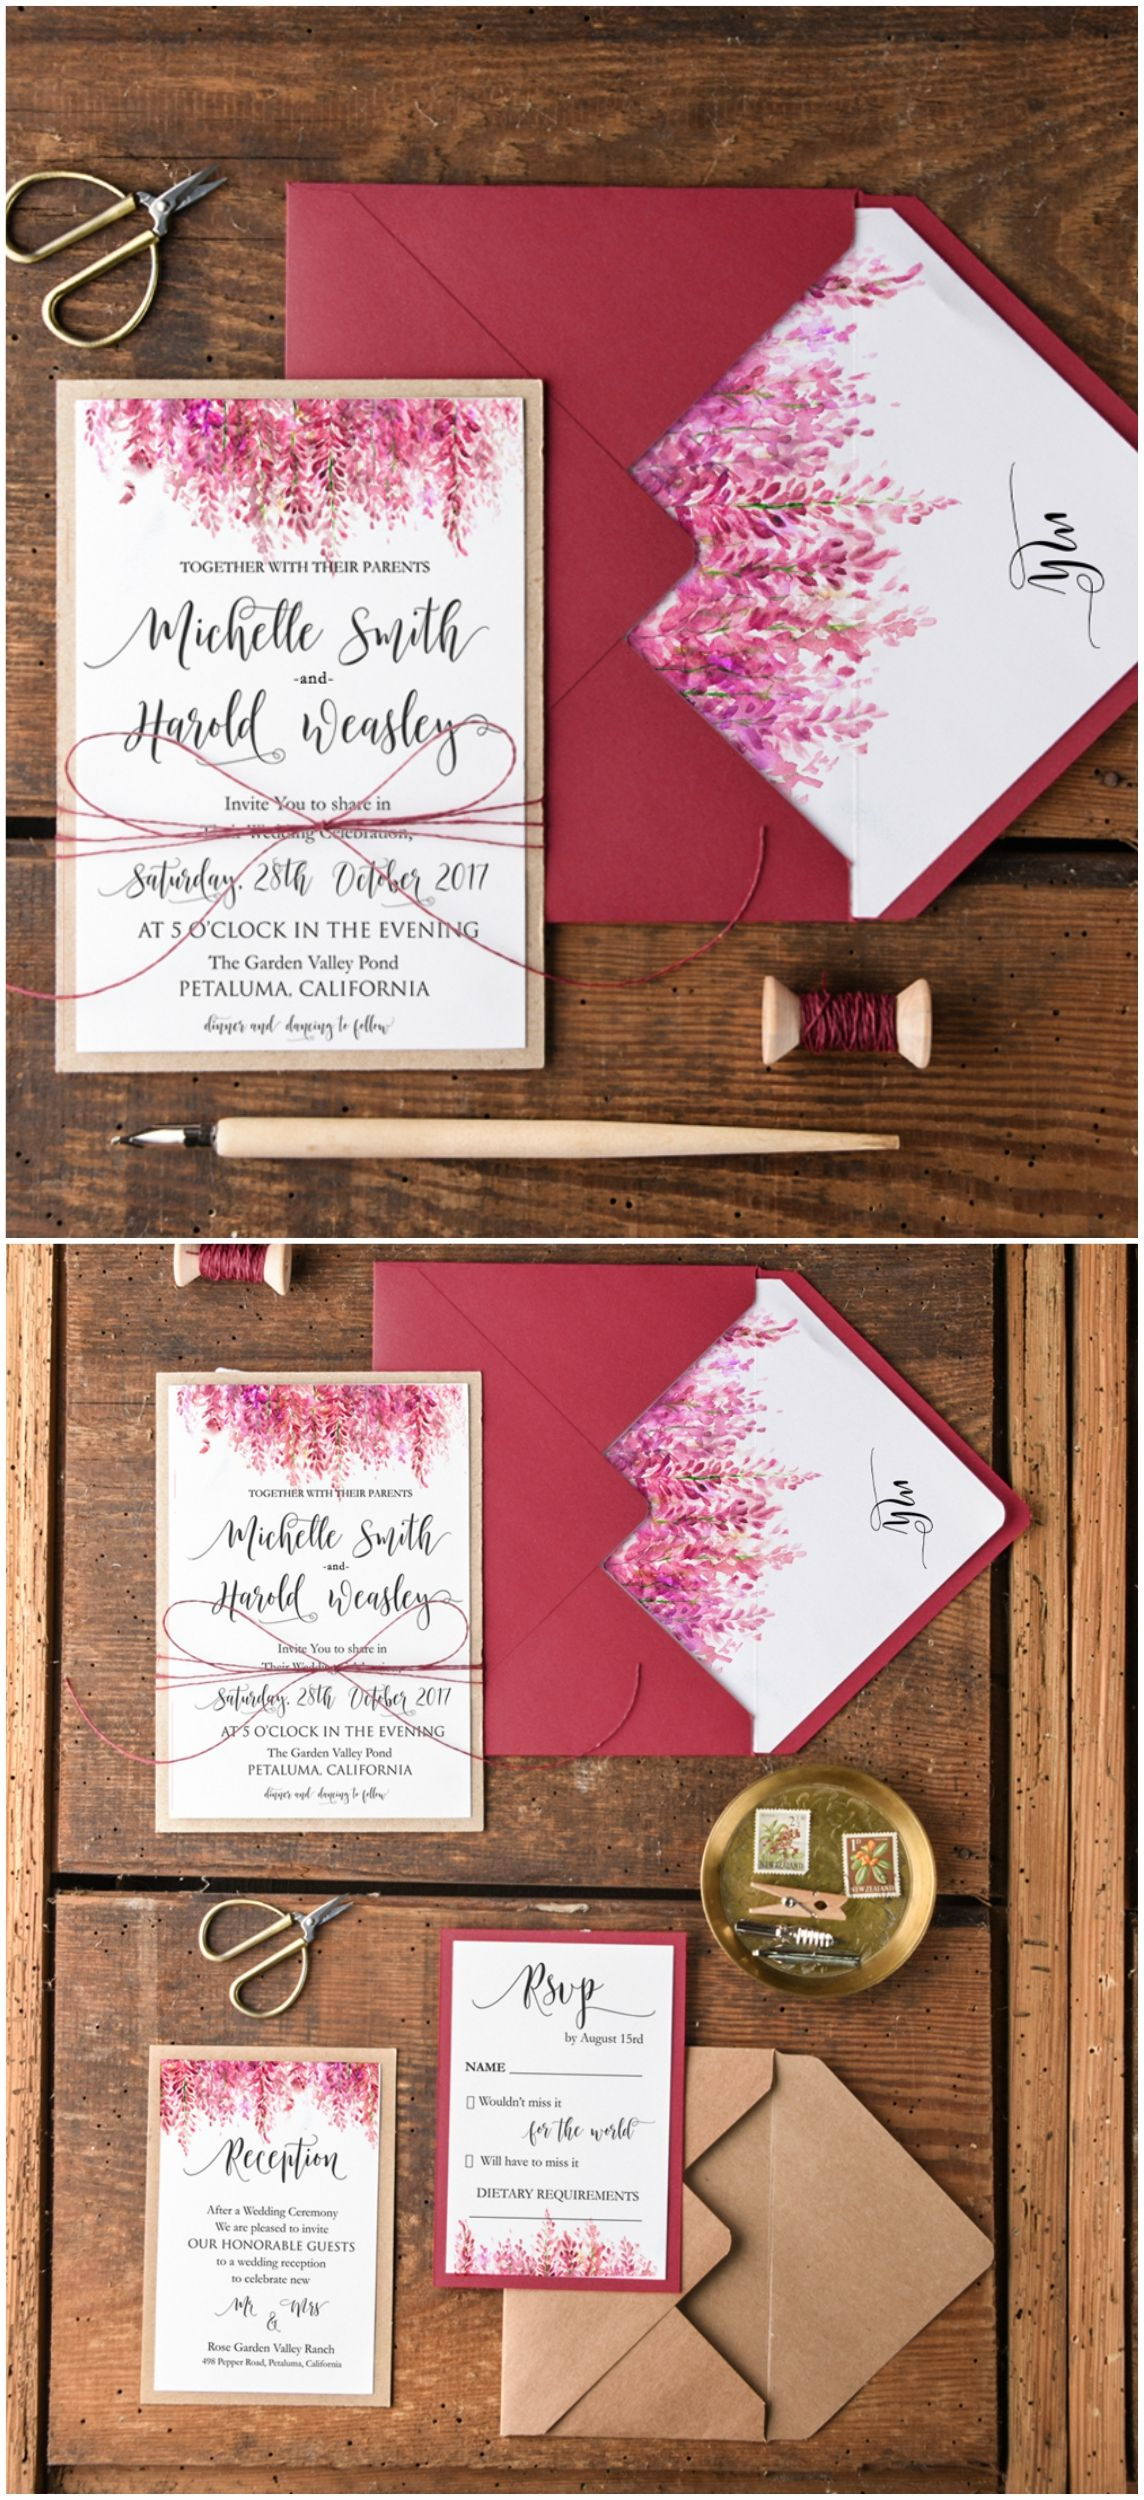 WEDDING INVITATIONS watercolor   Pinterest   Weddingideas, Floral ...